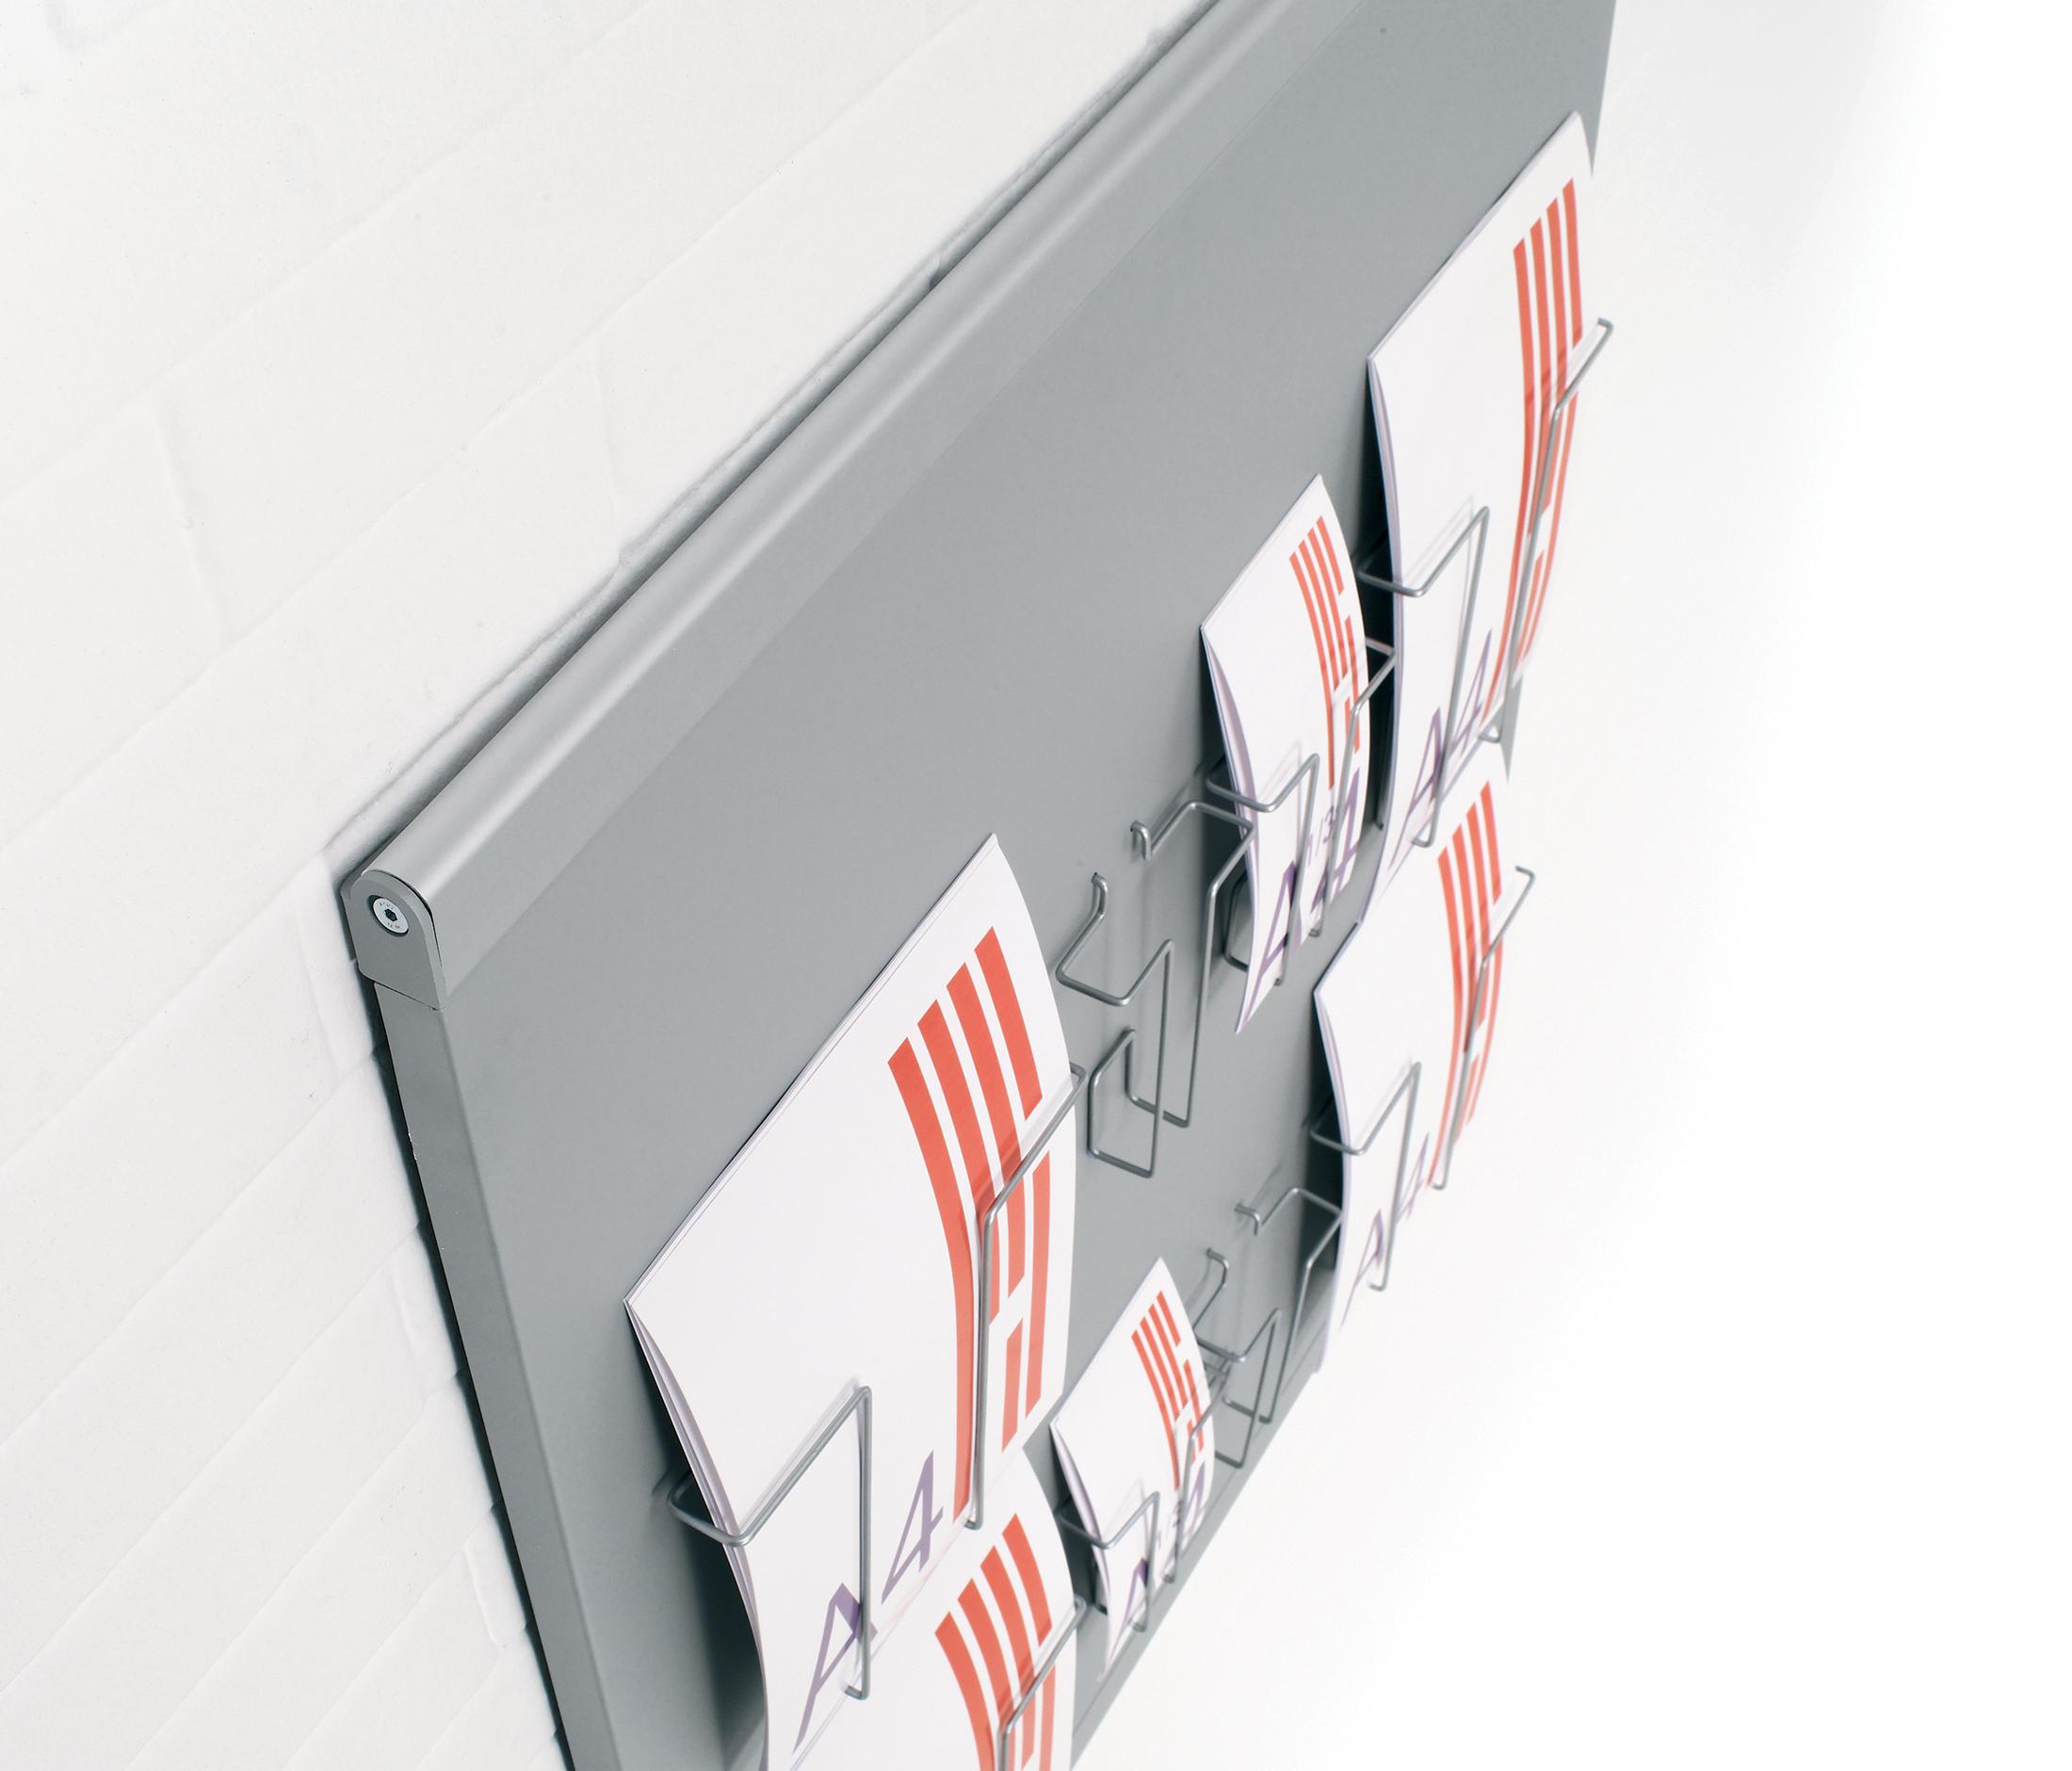 845 m pr sentoir expo wall mural porte revues de planning sisplamo architonic. Black Bedroom Furniture Sets. Home Design Ideas